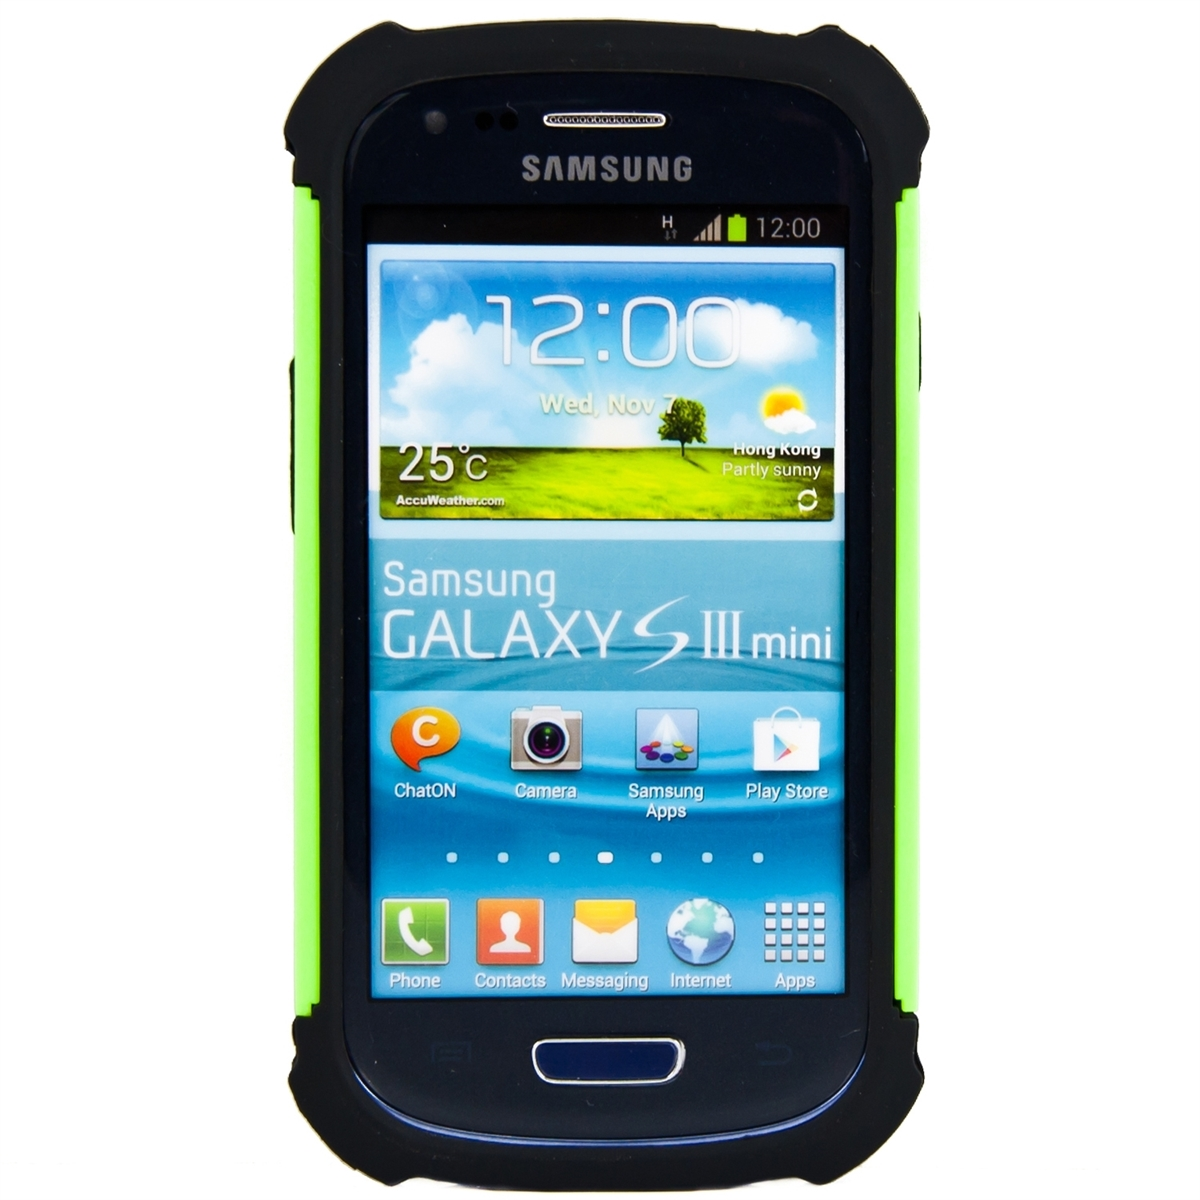 Outdoor Handy Samsung Erfahrung 10